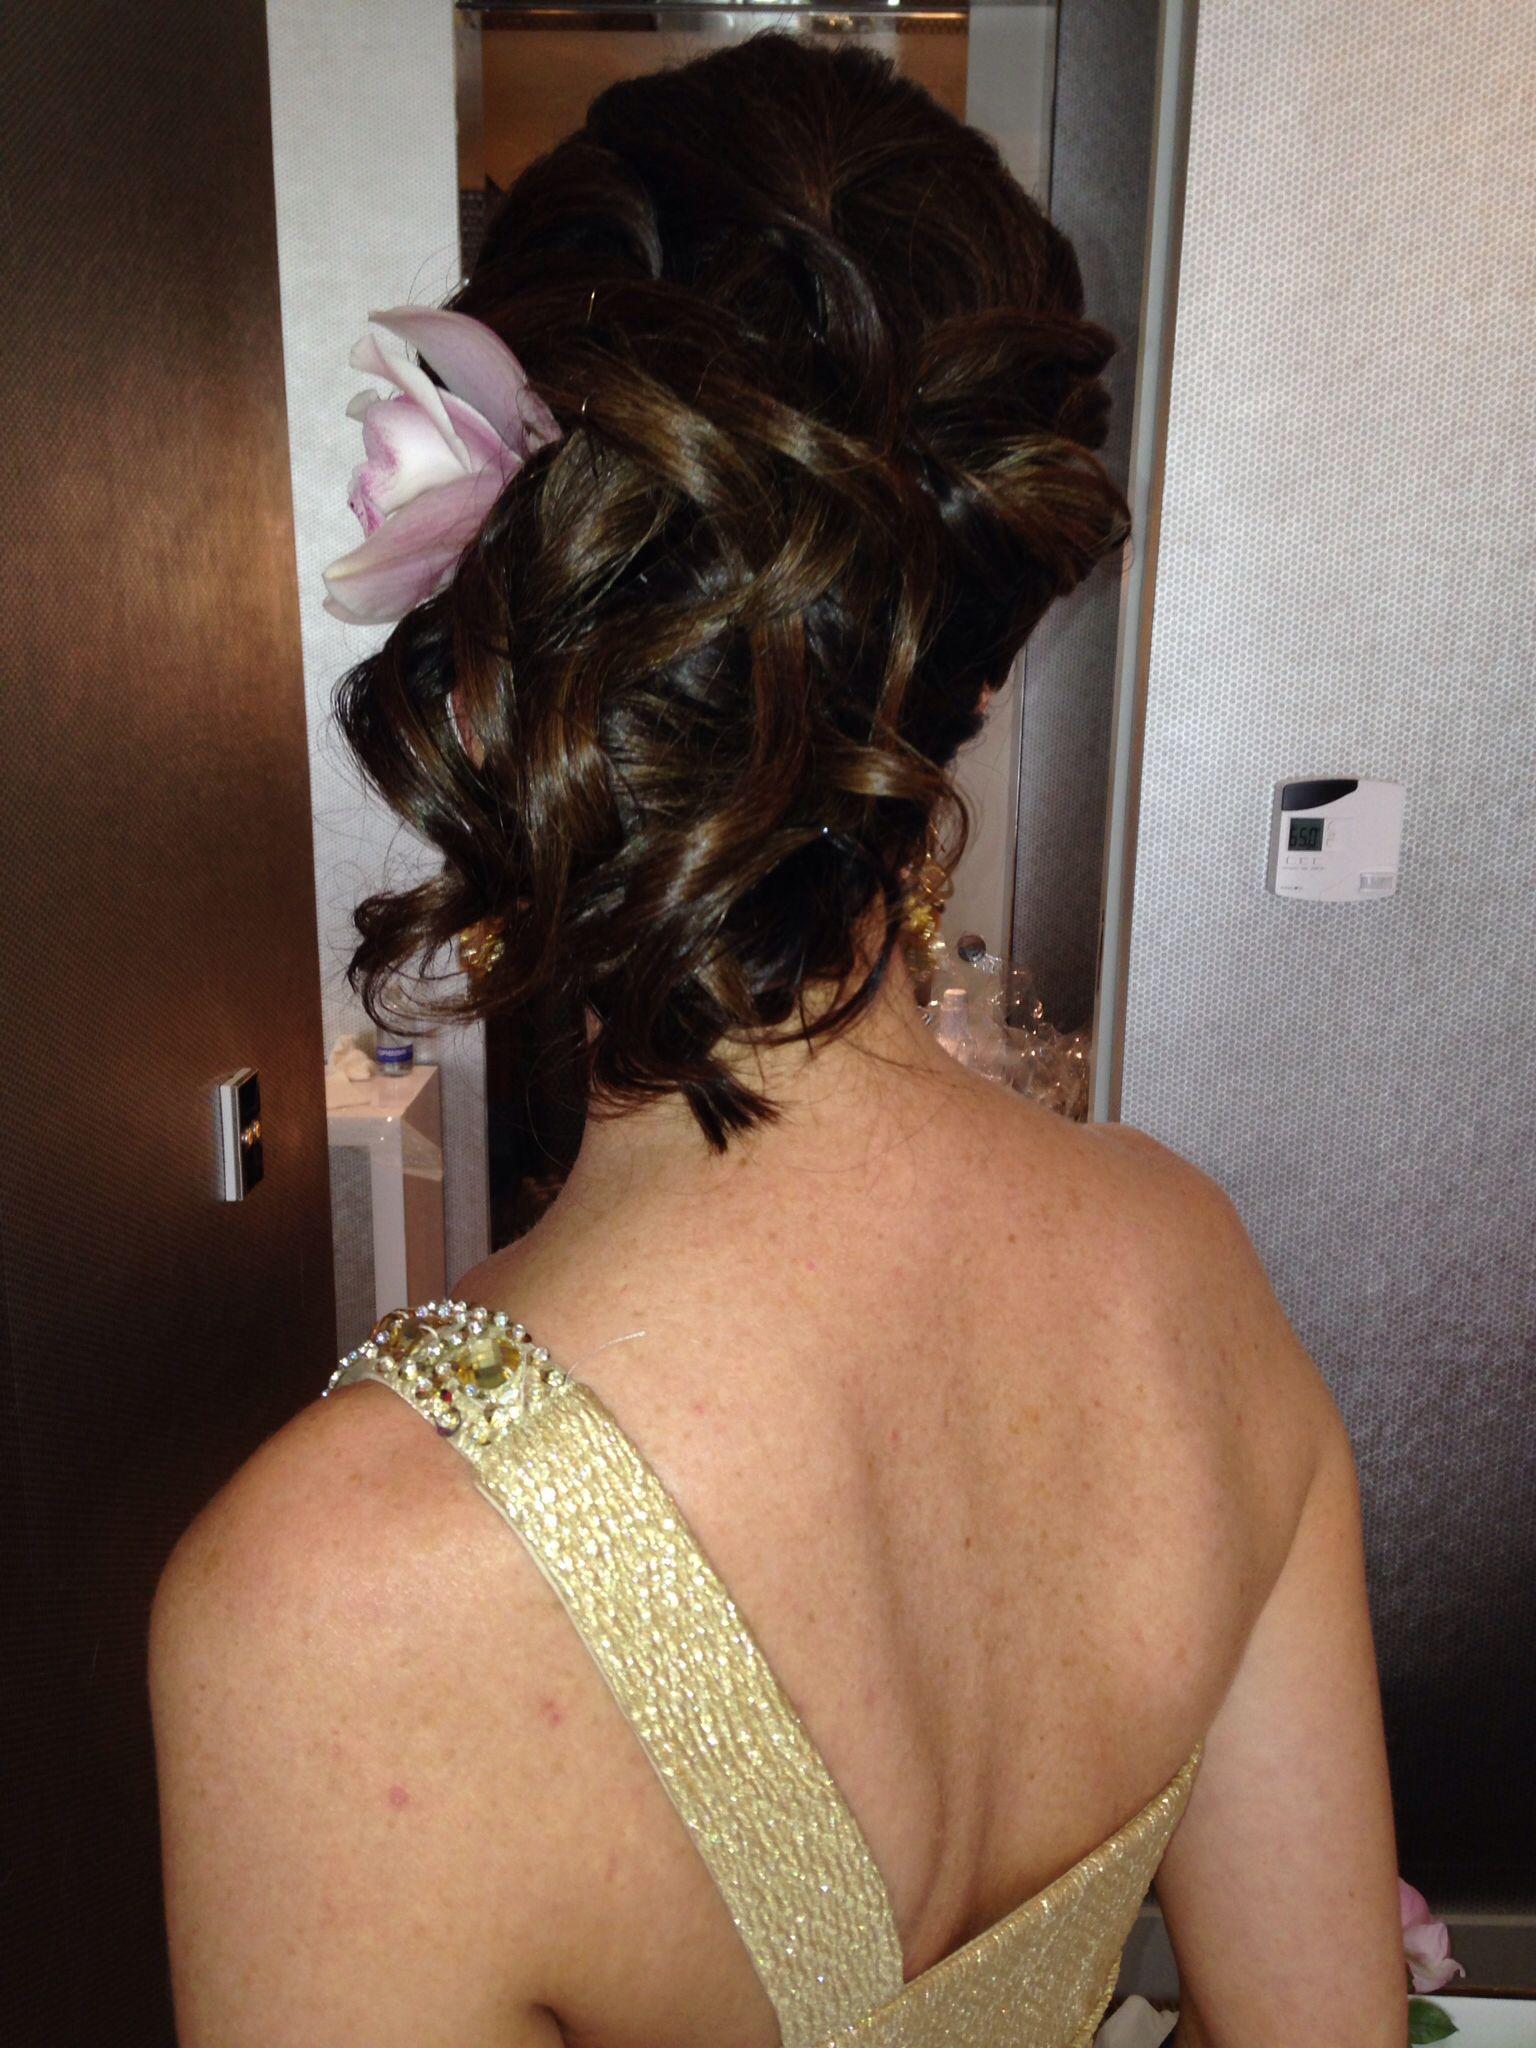 maid of honor hairstyles - newyorkfashion